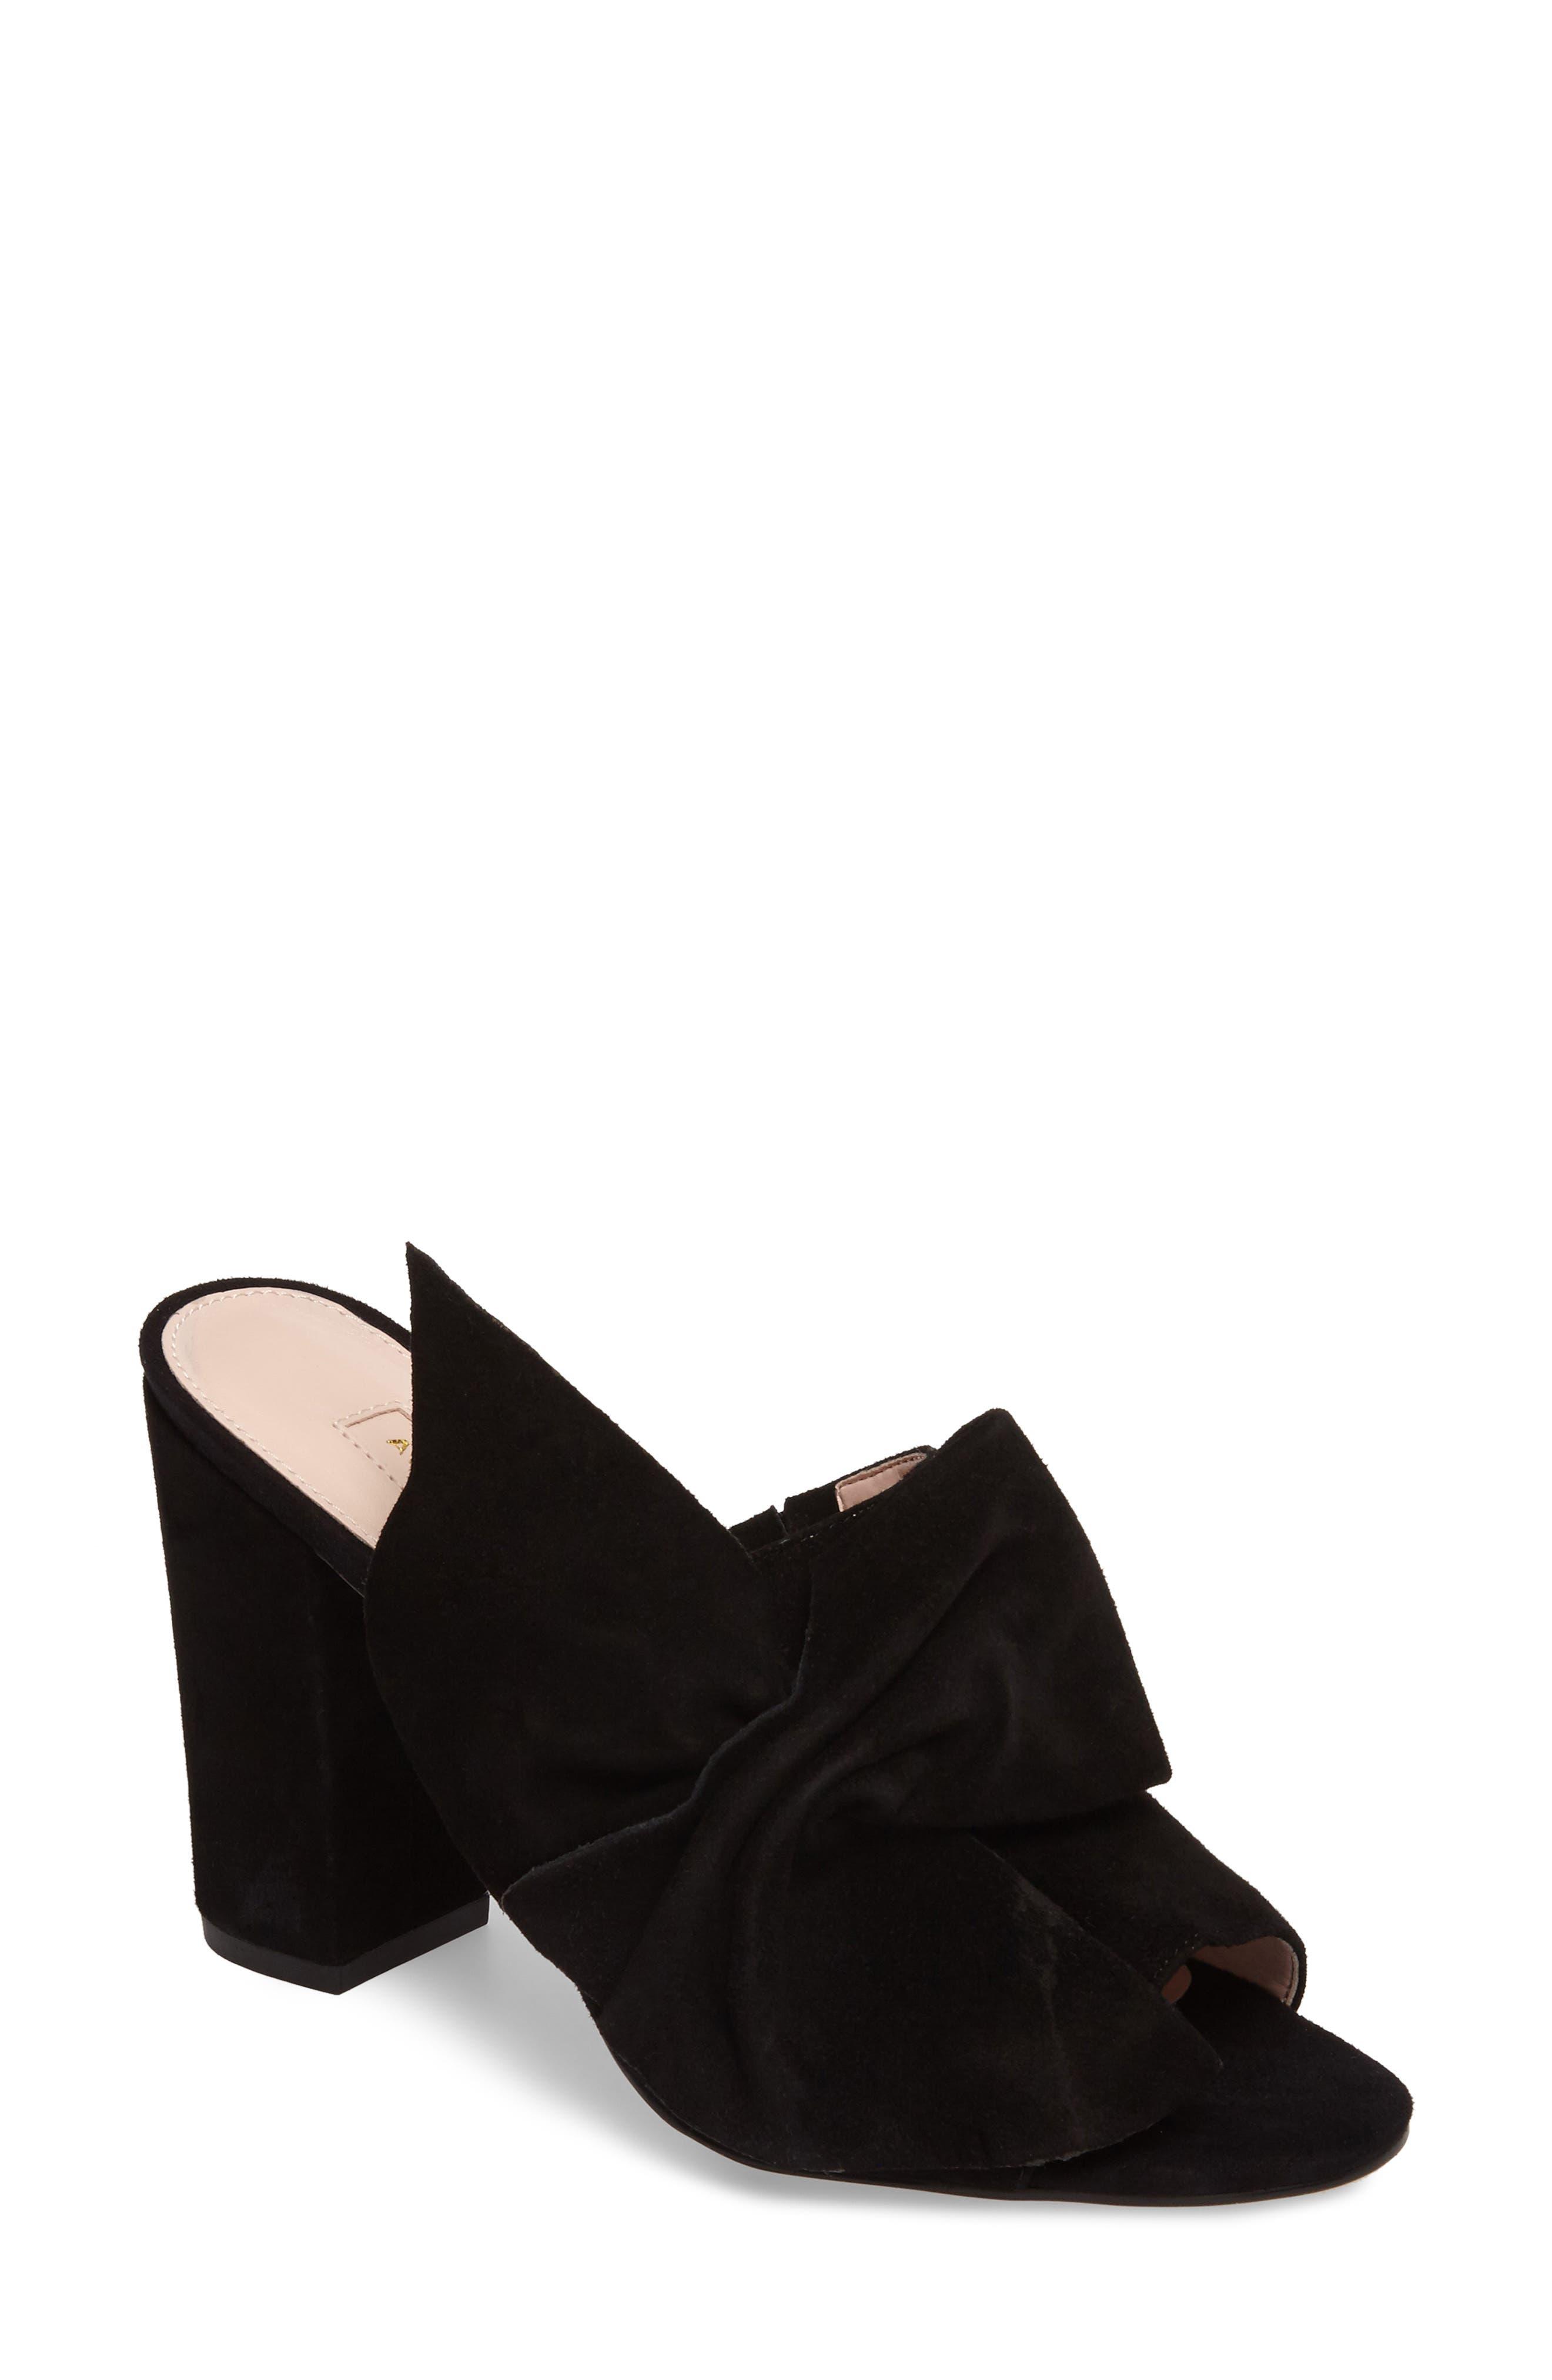 Marie Bow Slide Sandal,                             Main thumbnail 1, color,                             002